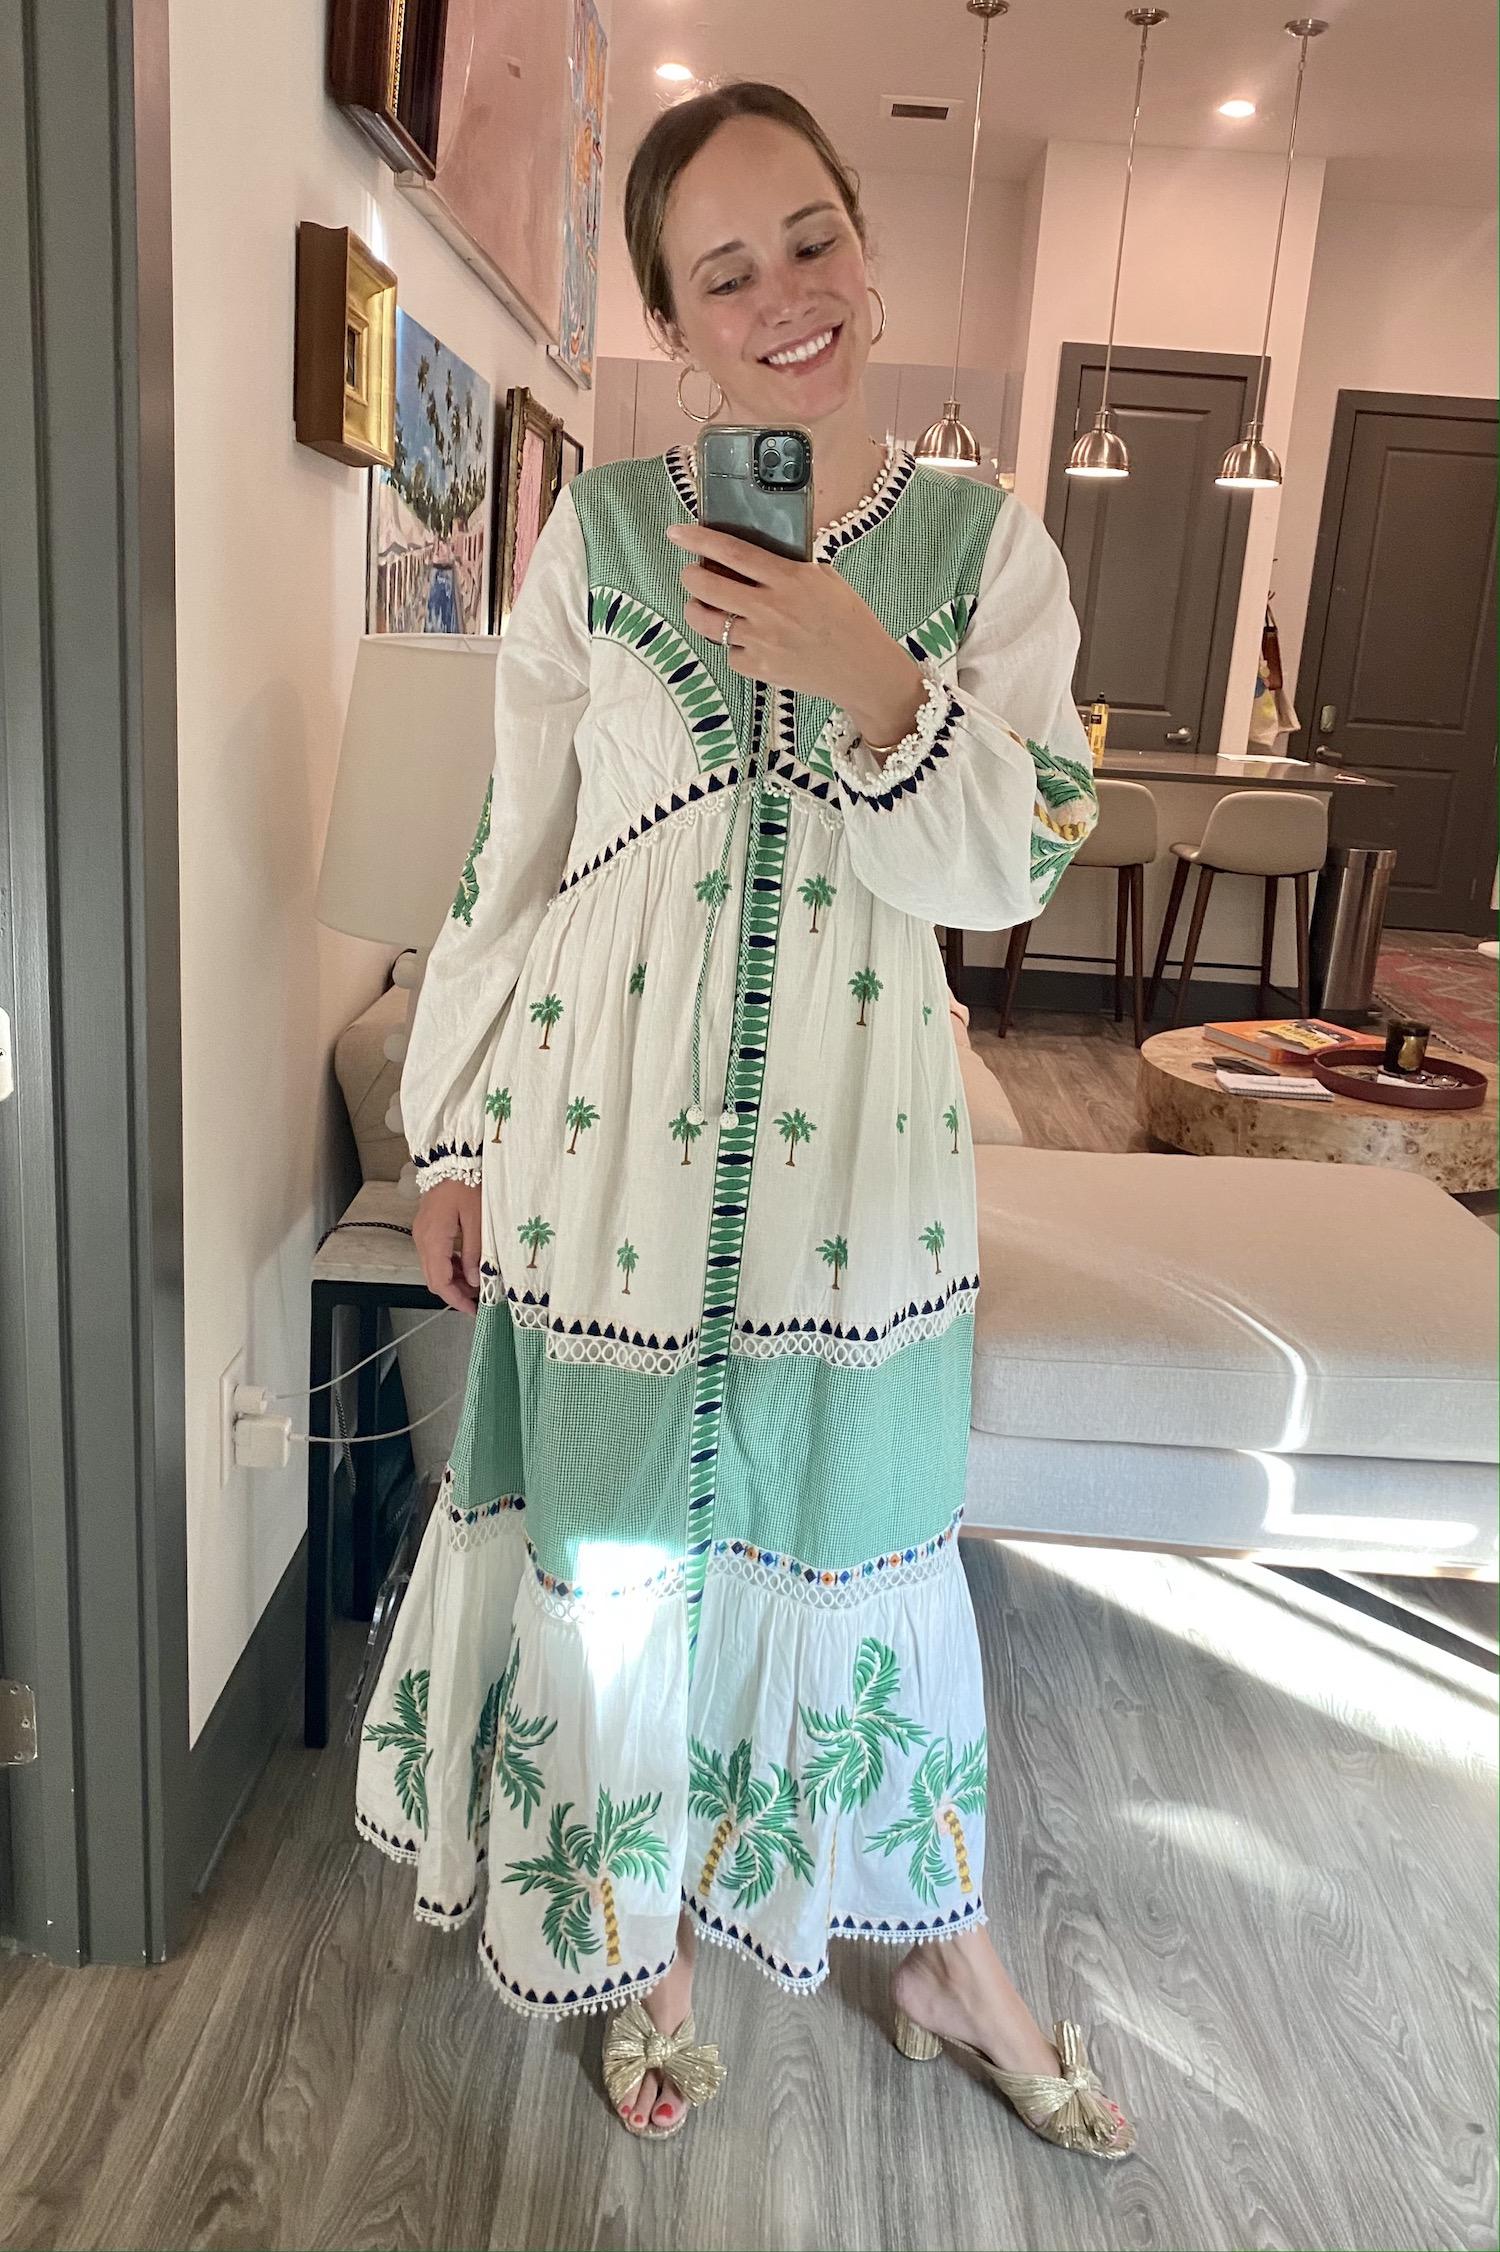 Farm Rio dress | Last Week in Outfits 6.28.21